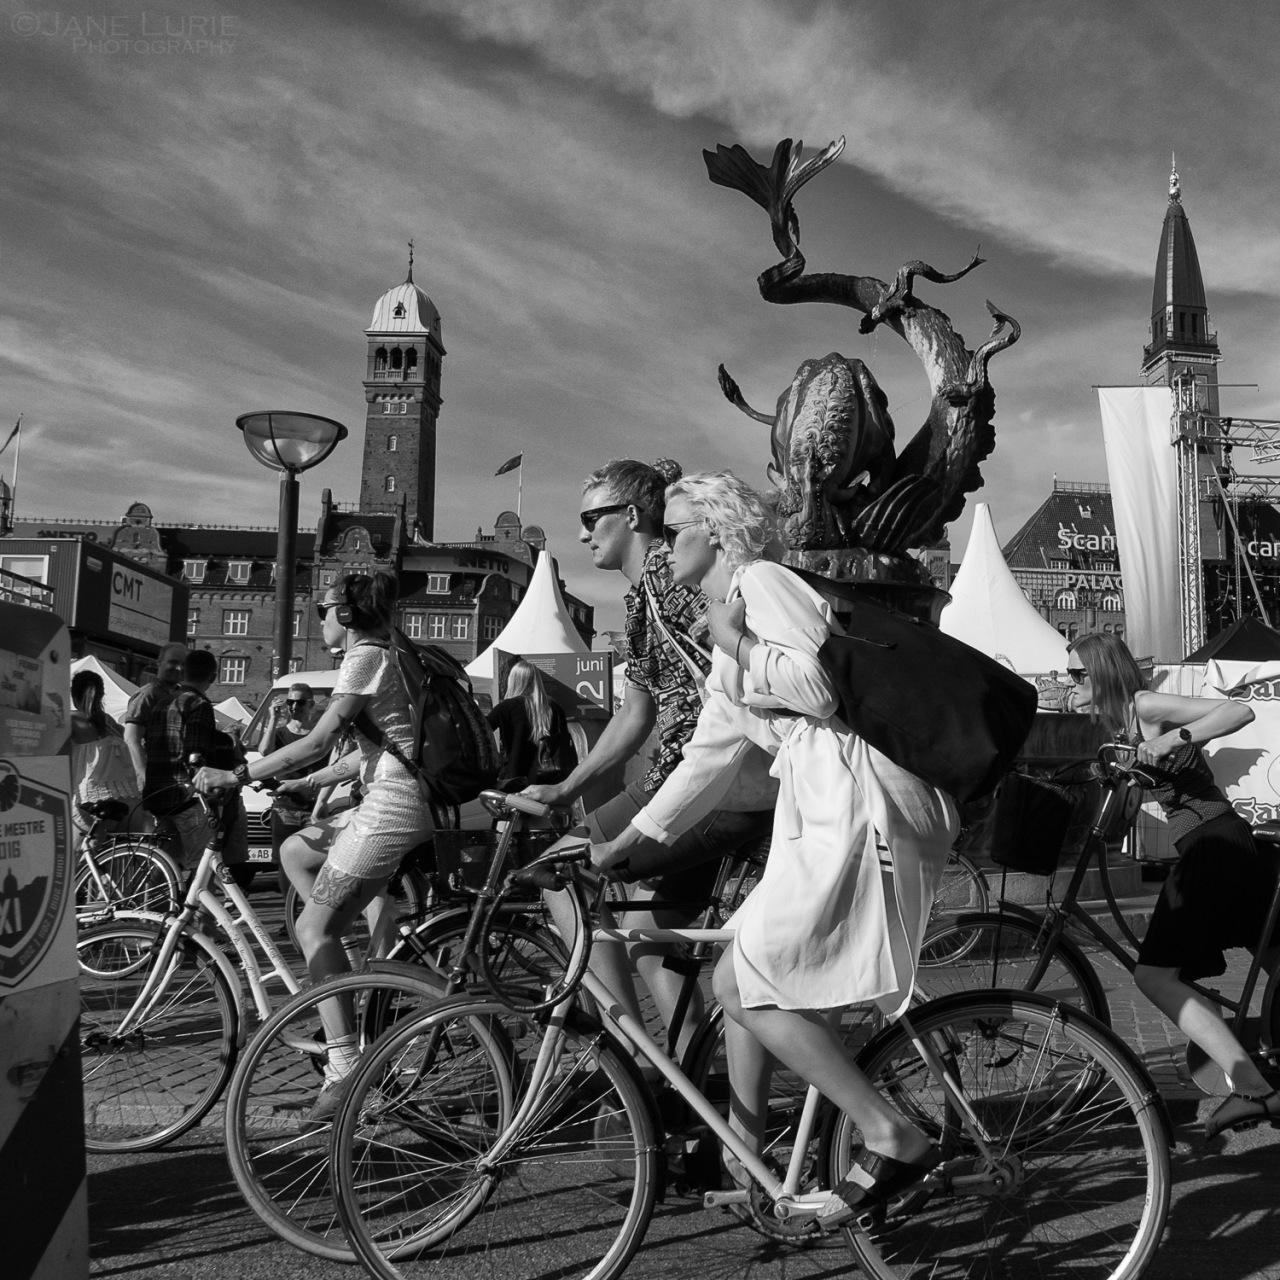 Bicycles, Bicycles! Copenhagen